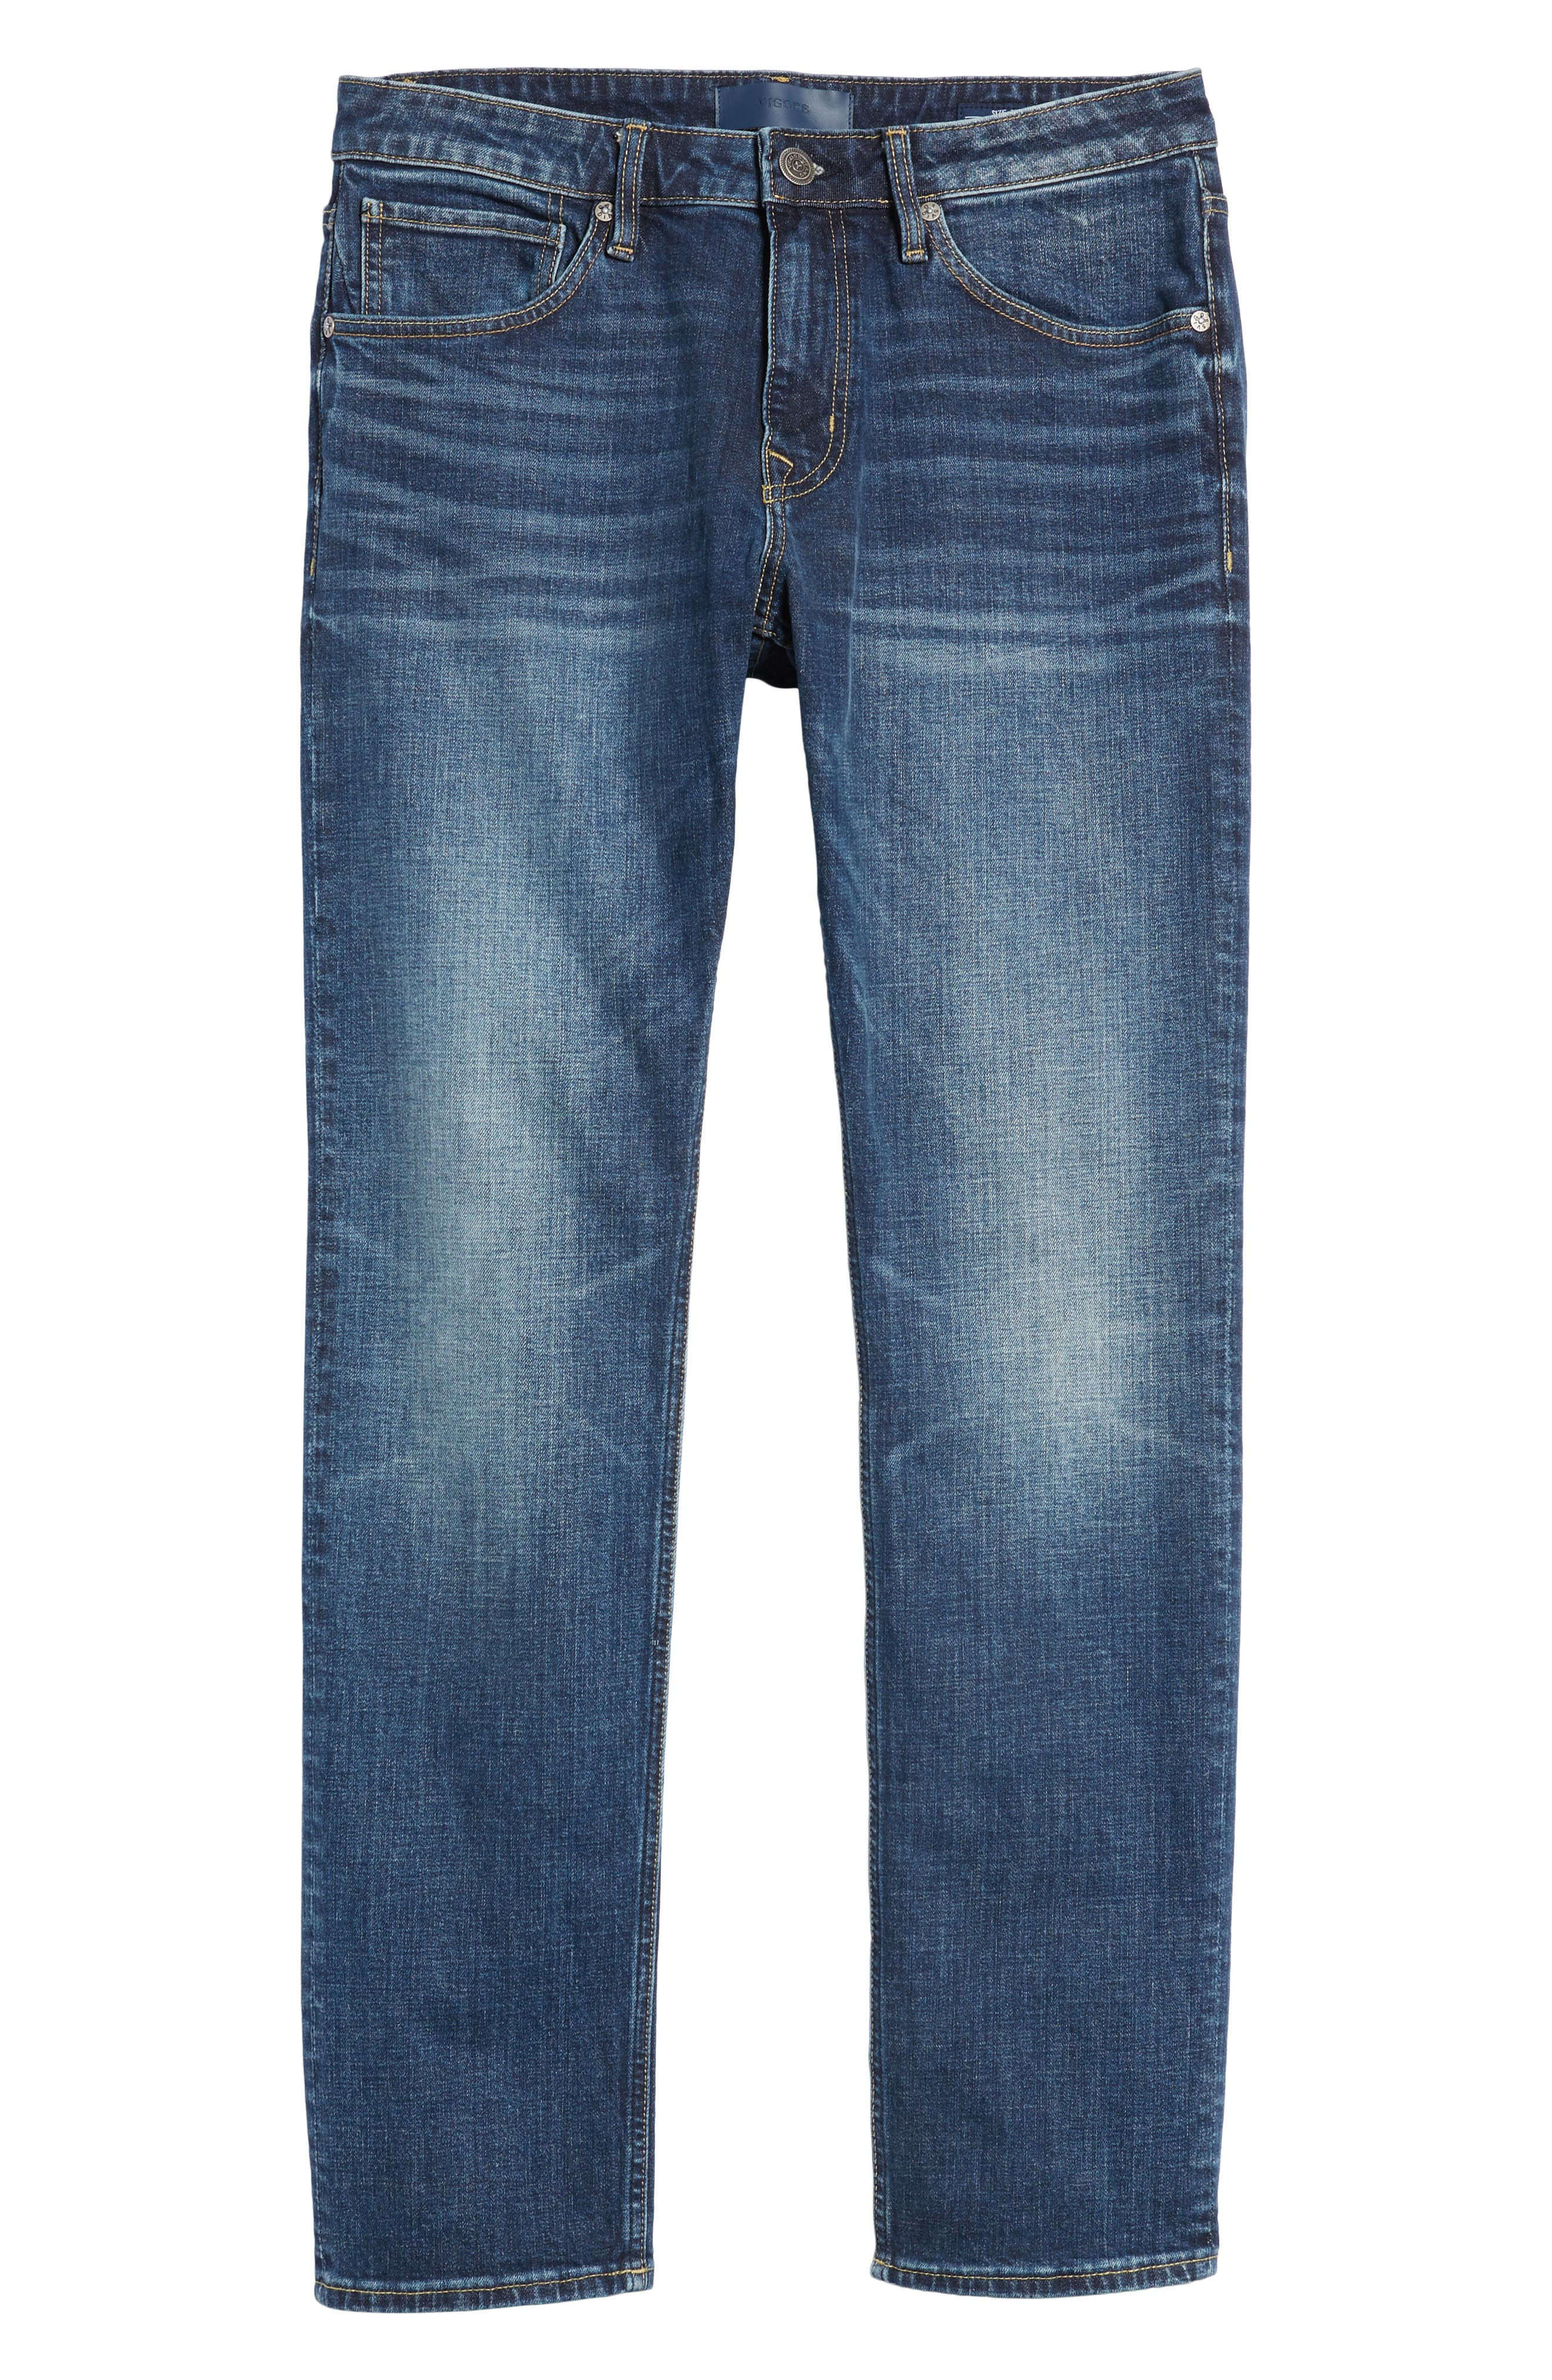 Slim Straight Leg Jeans,                             Alternate thumbnail 6, color,                             Medium Wash